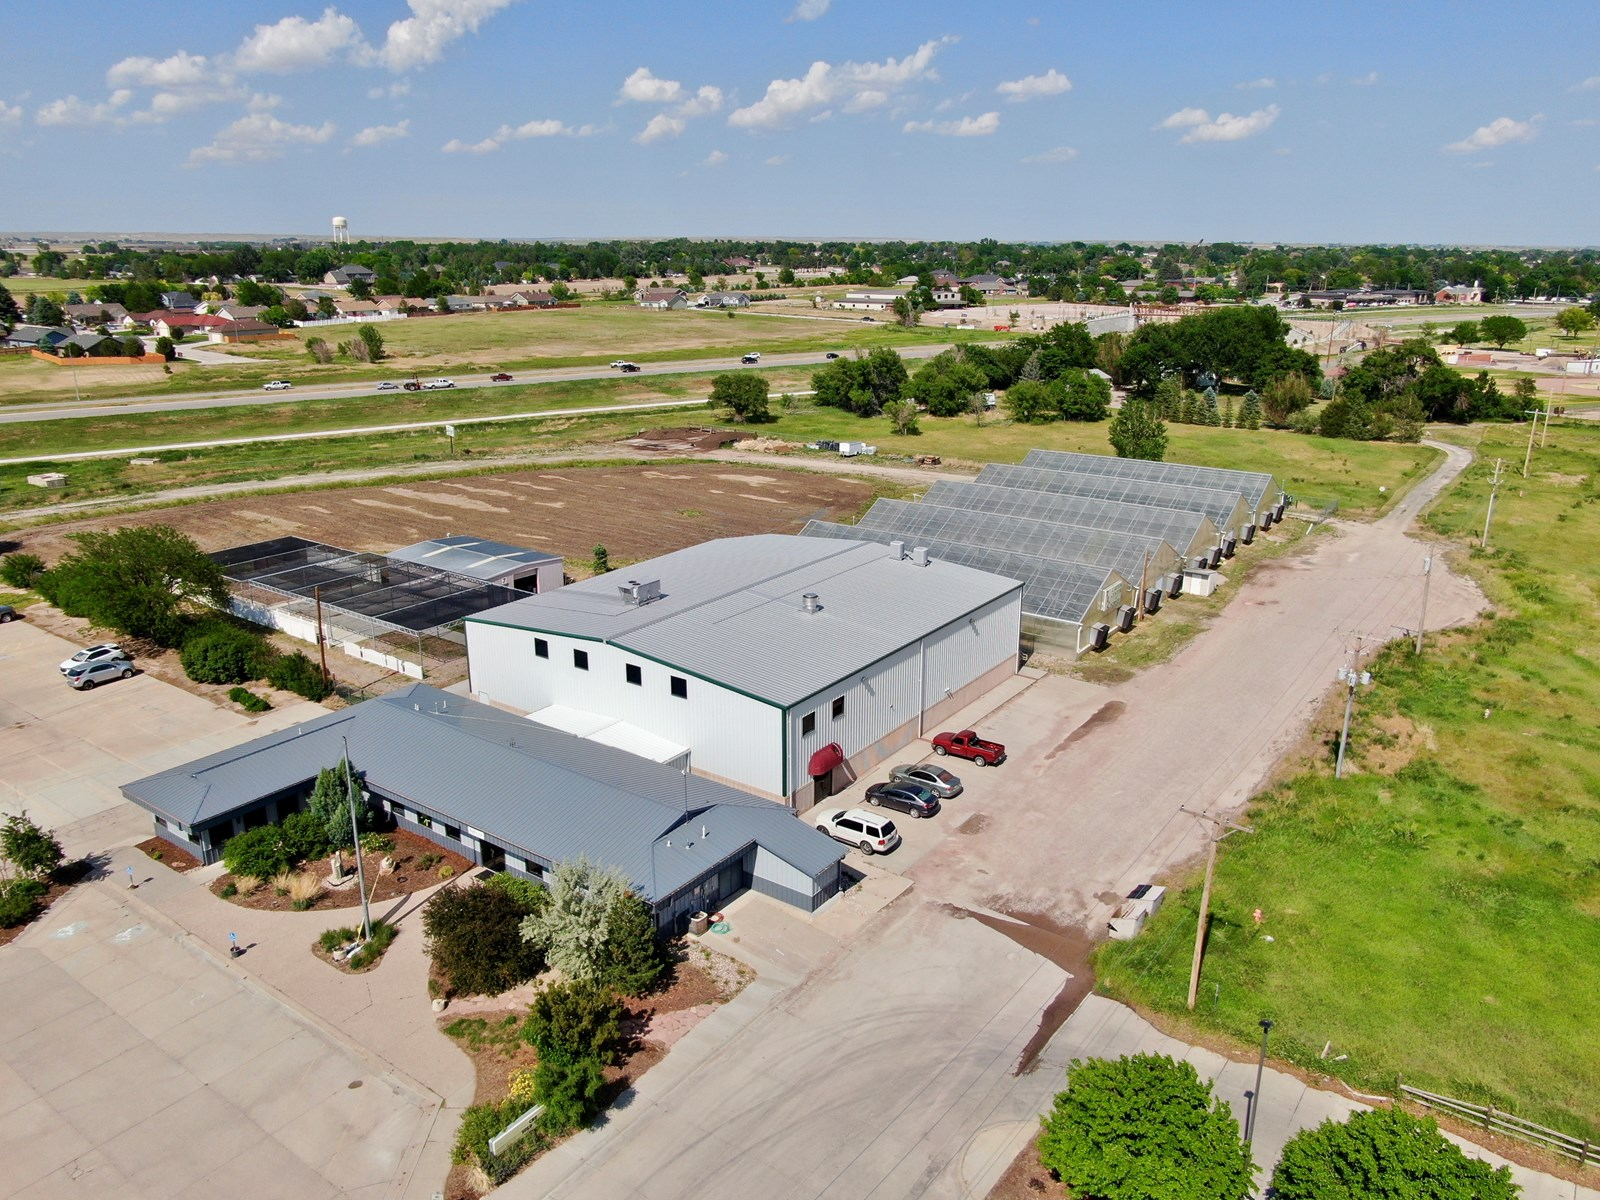 Nebraska hemp grow greenhouses for sale